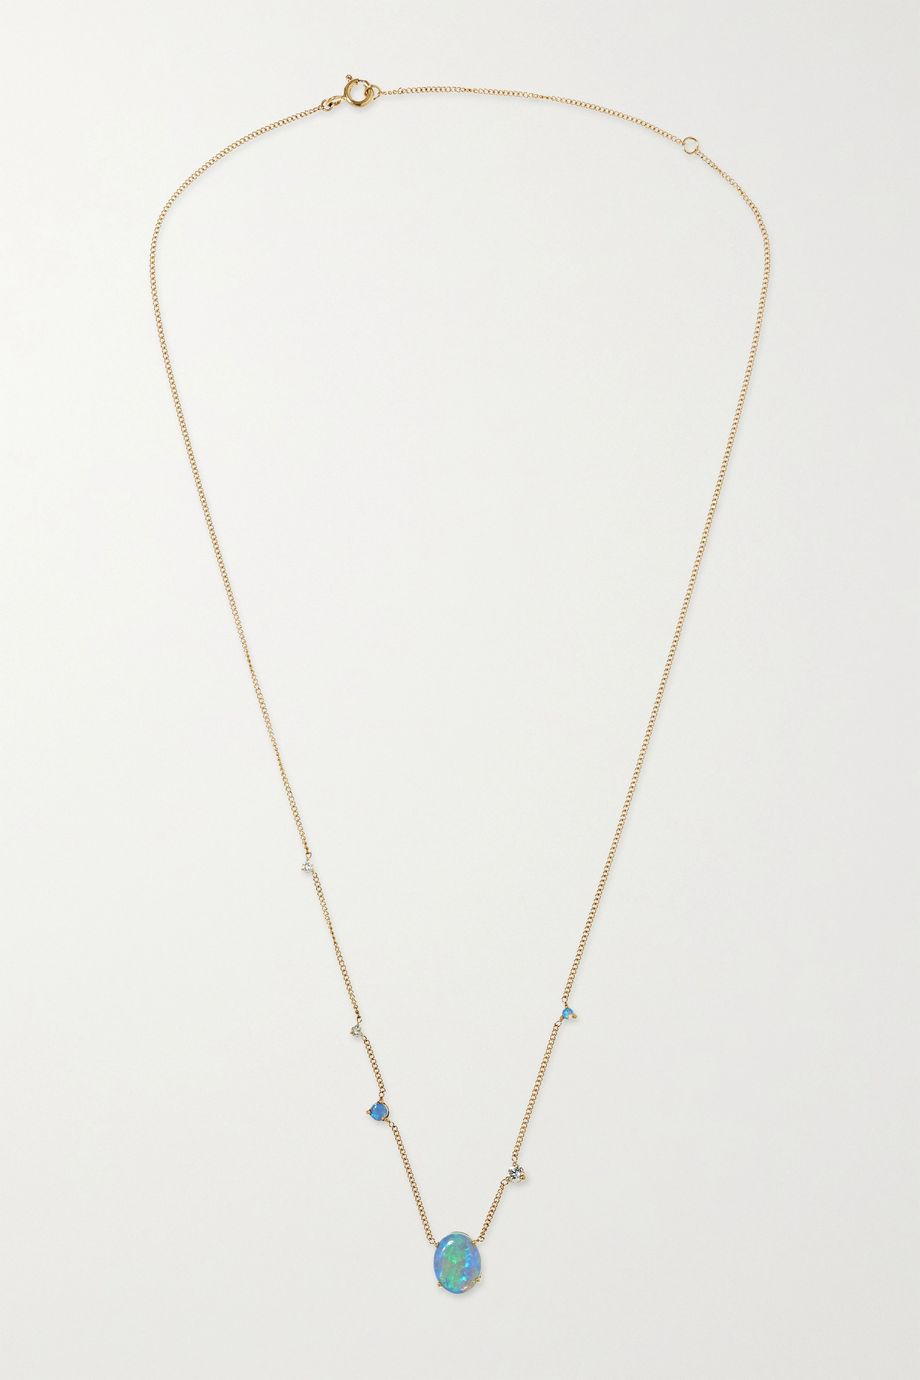 Wwake 14-karat gold, opal and diamond necklace